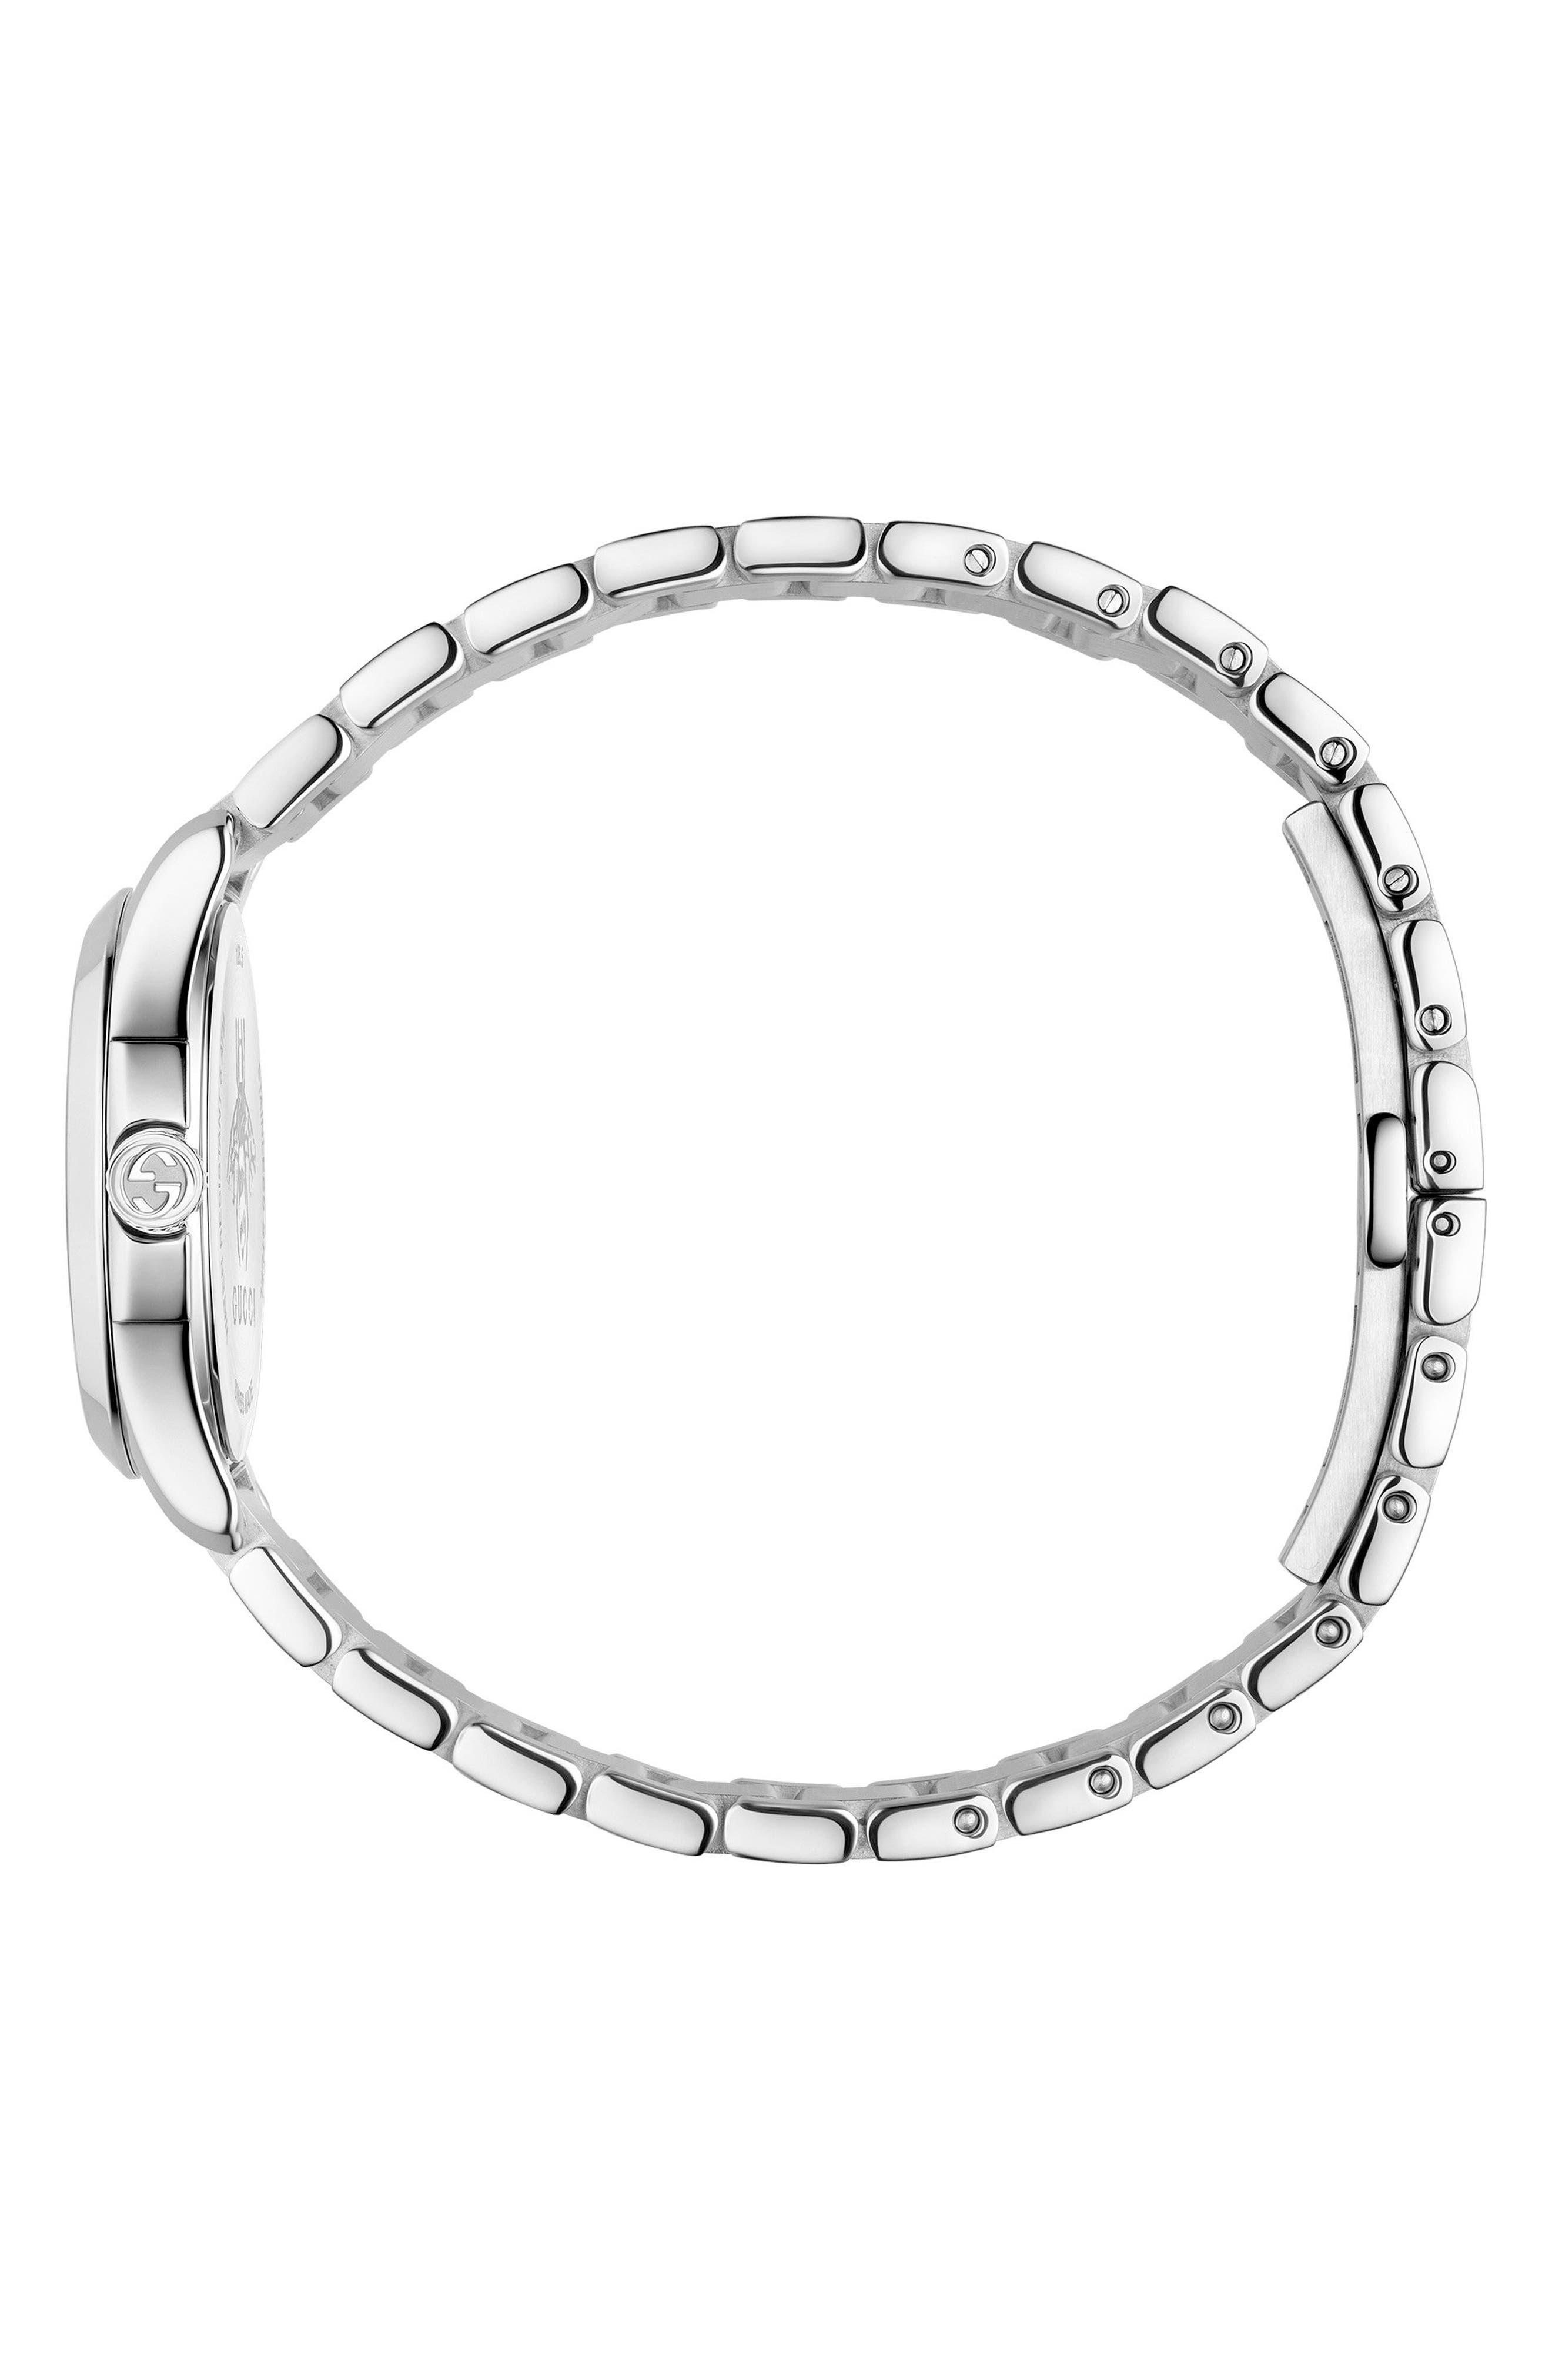 GUCCI, G-Timeless Bracelet Watch, 27mm, Alternate thumbnail 3, color, SILVER